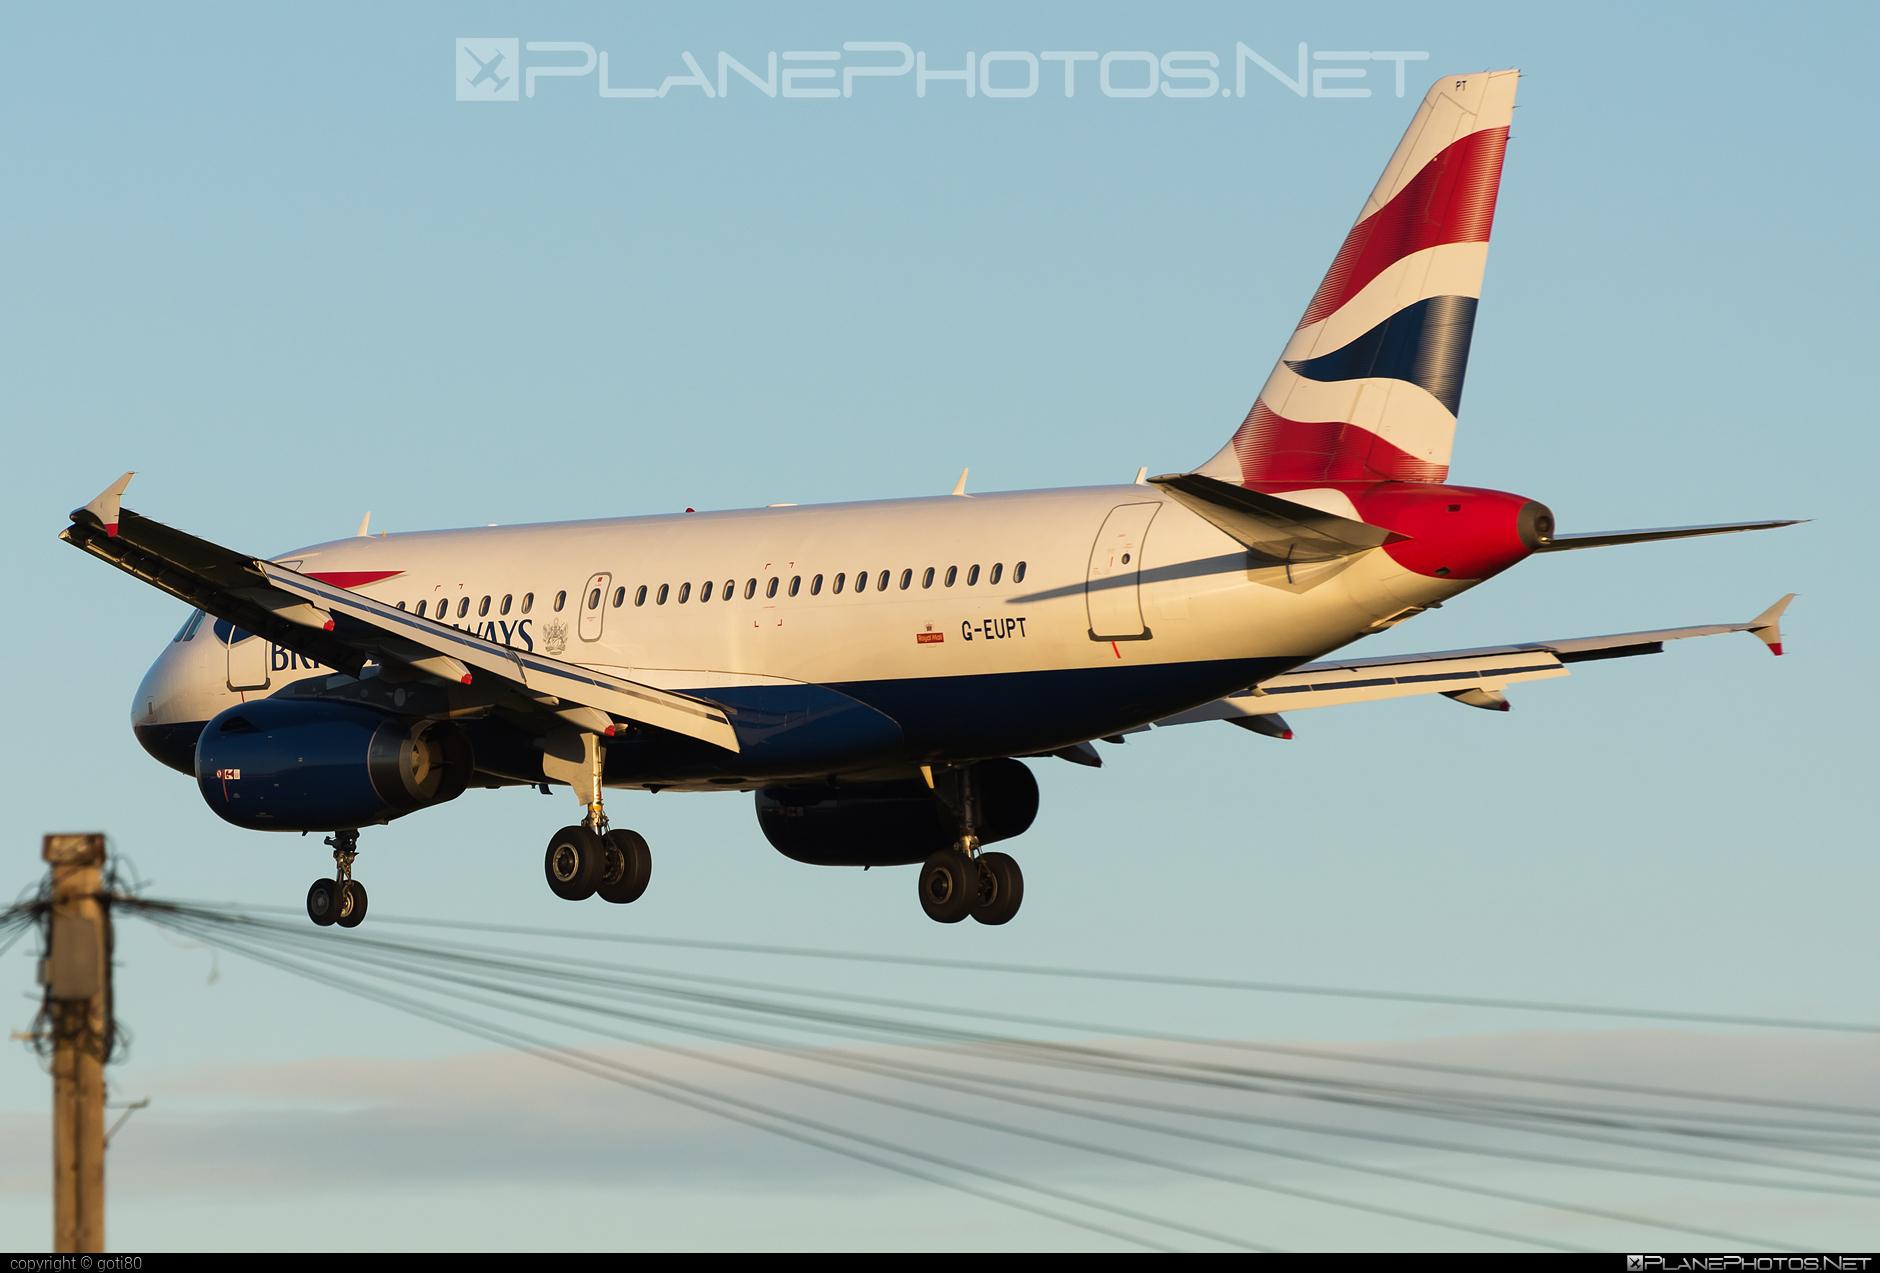 British Airways Airbus A319-131 - G-EUPT #a319 #a320family #airbus #airbus319 #britishairways